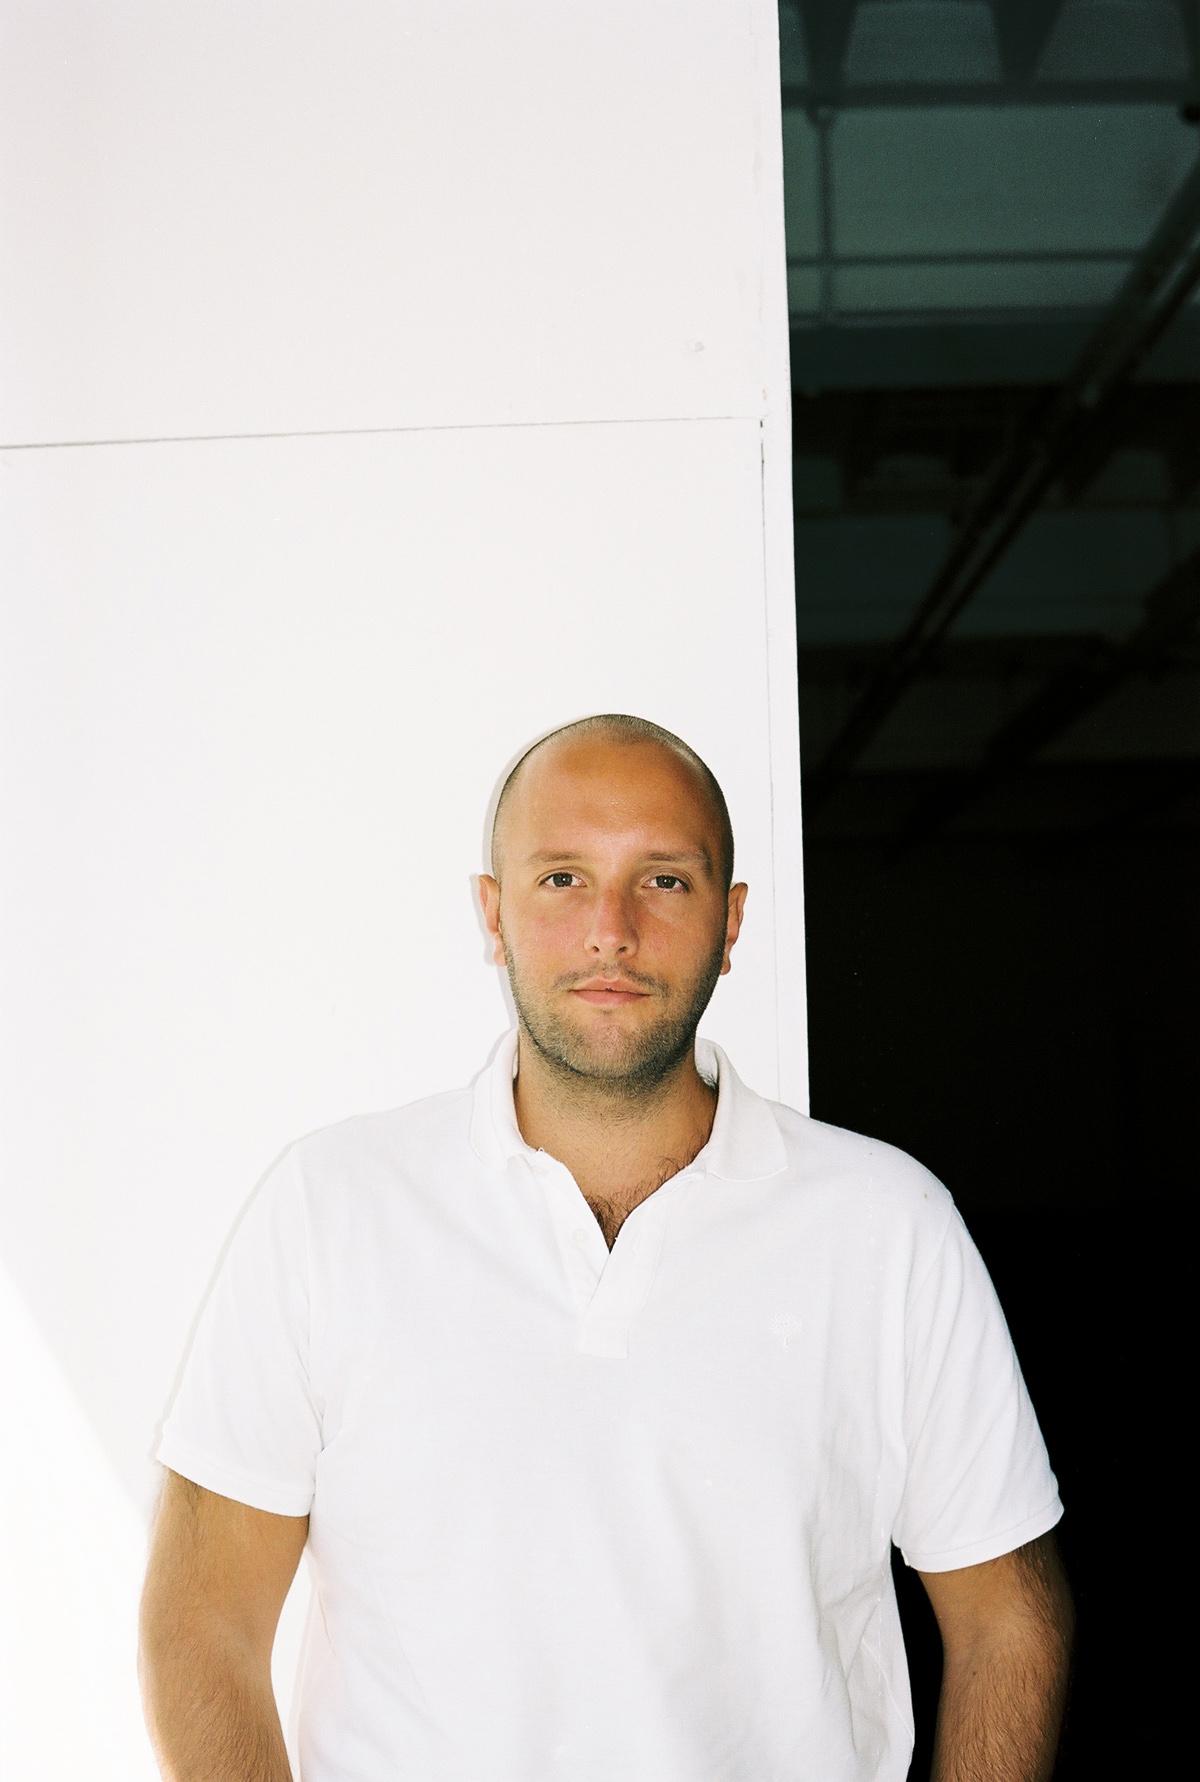 Simon Habegger Istituto Svizzero Milano Calling 2020/2021 Aceto, Alfredo (Bildende Kunst)